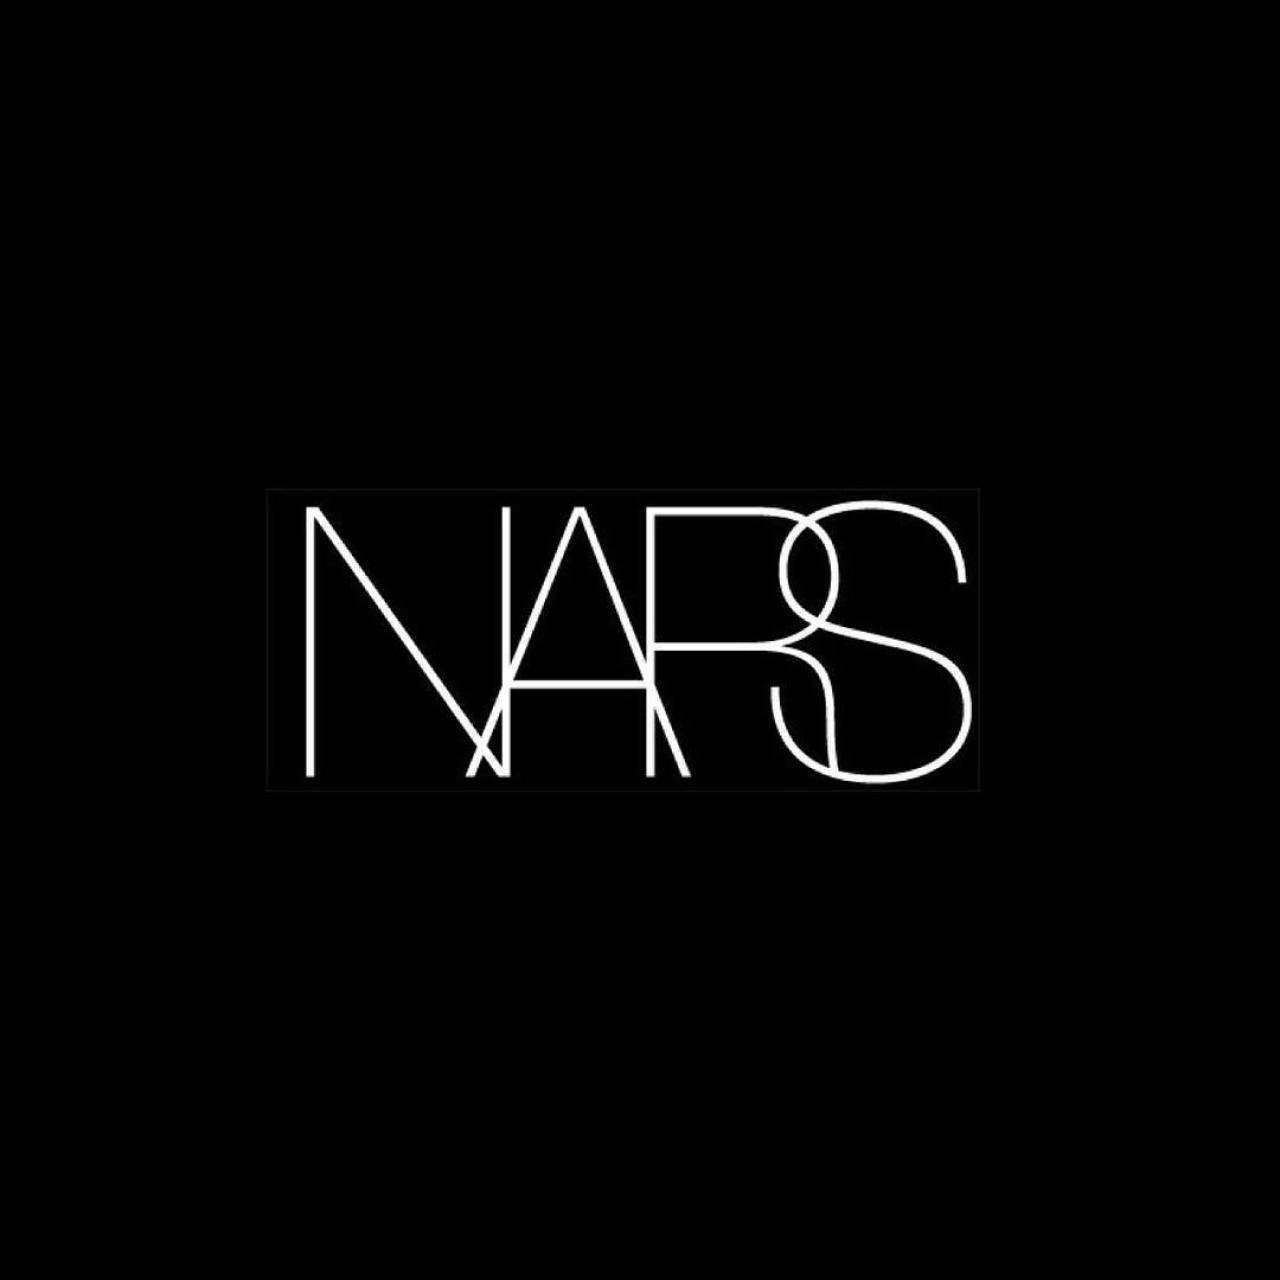 NARS ロゴ